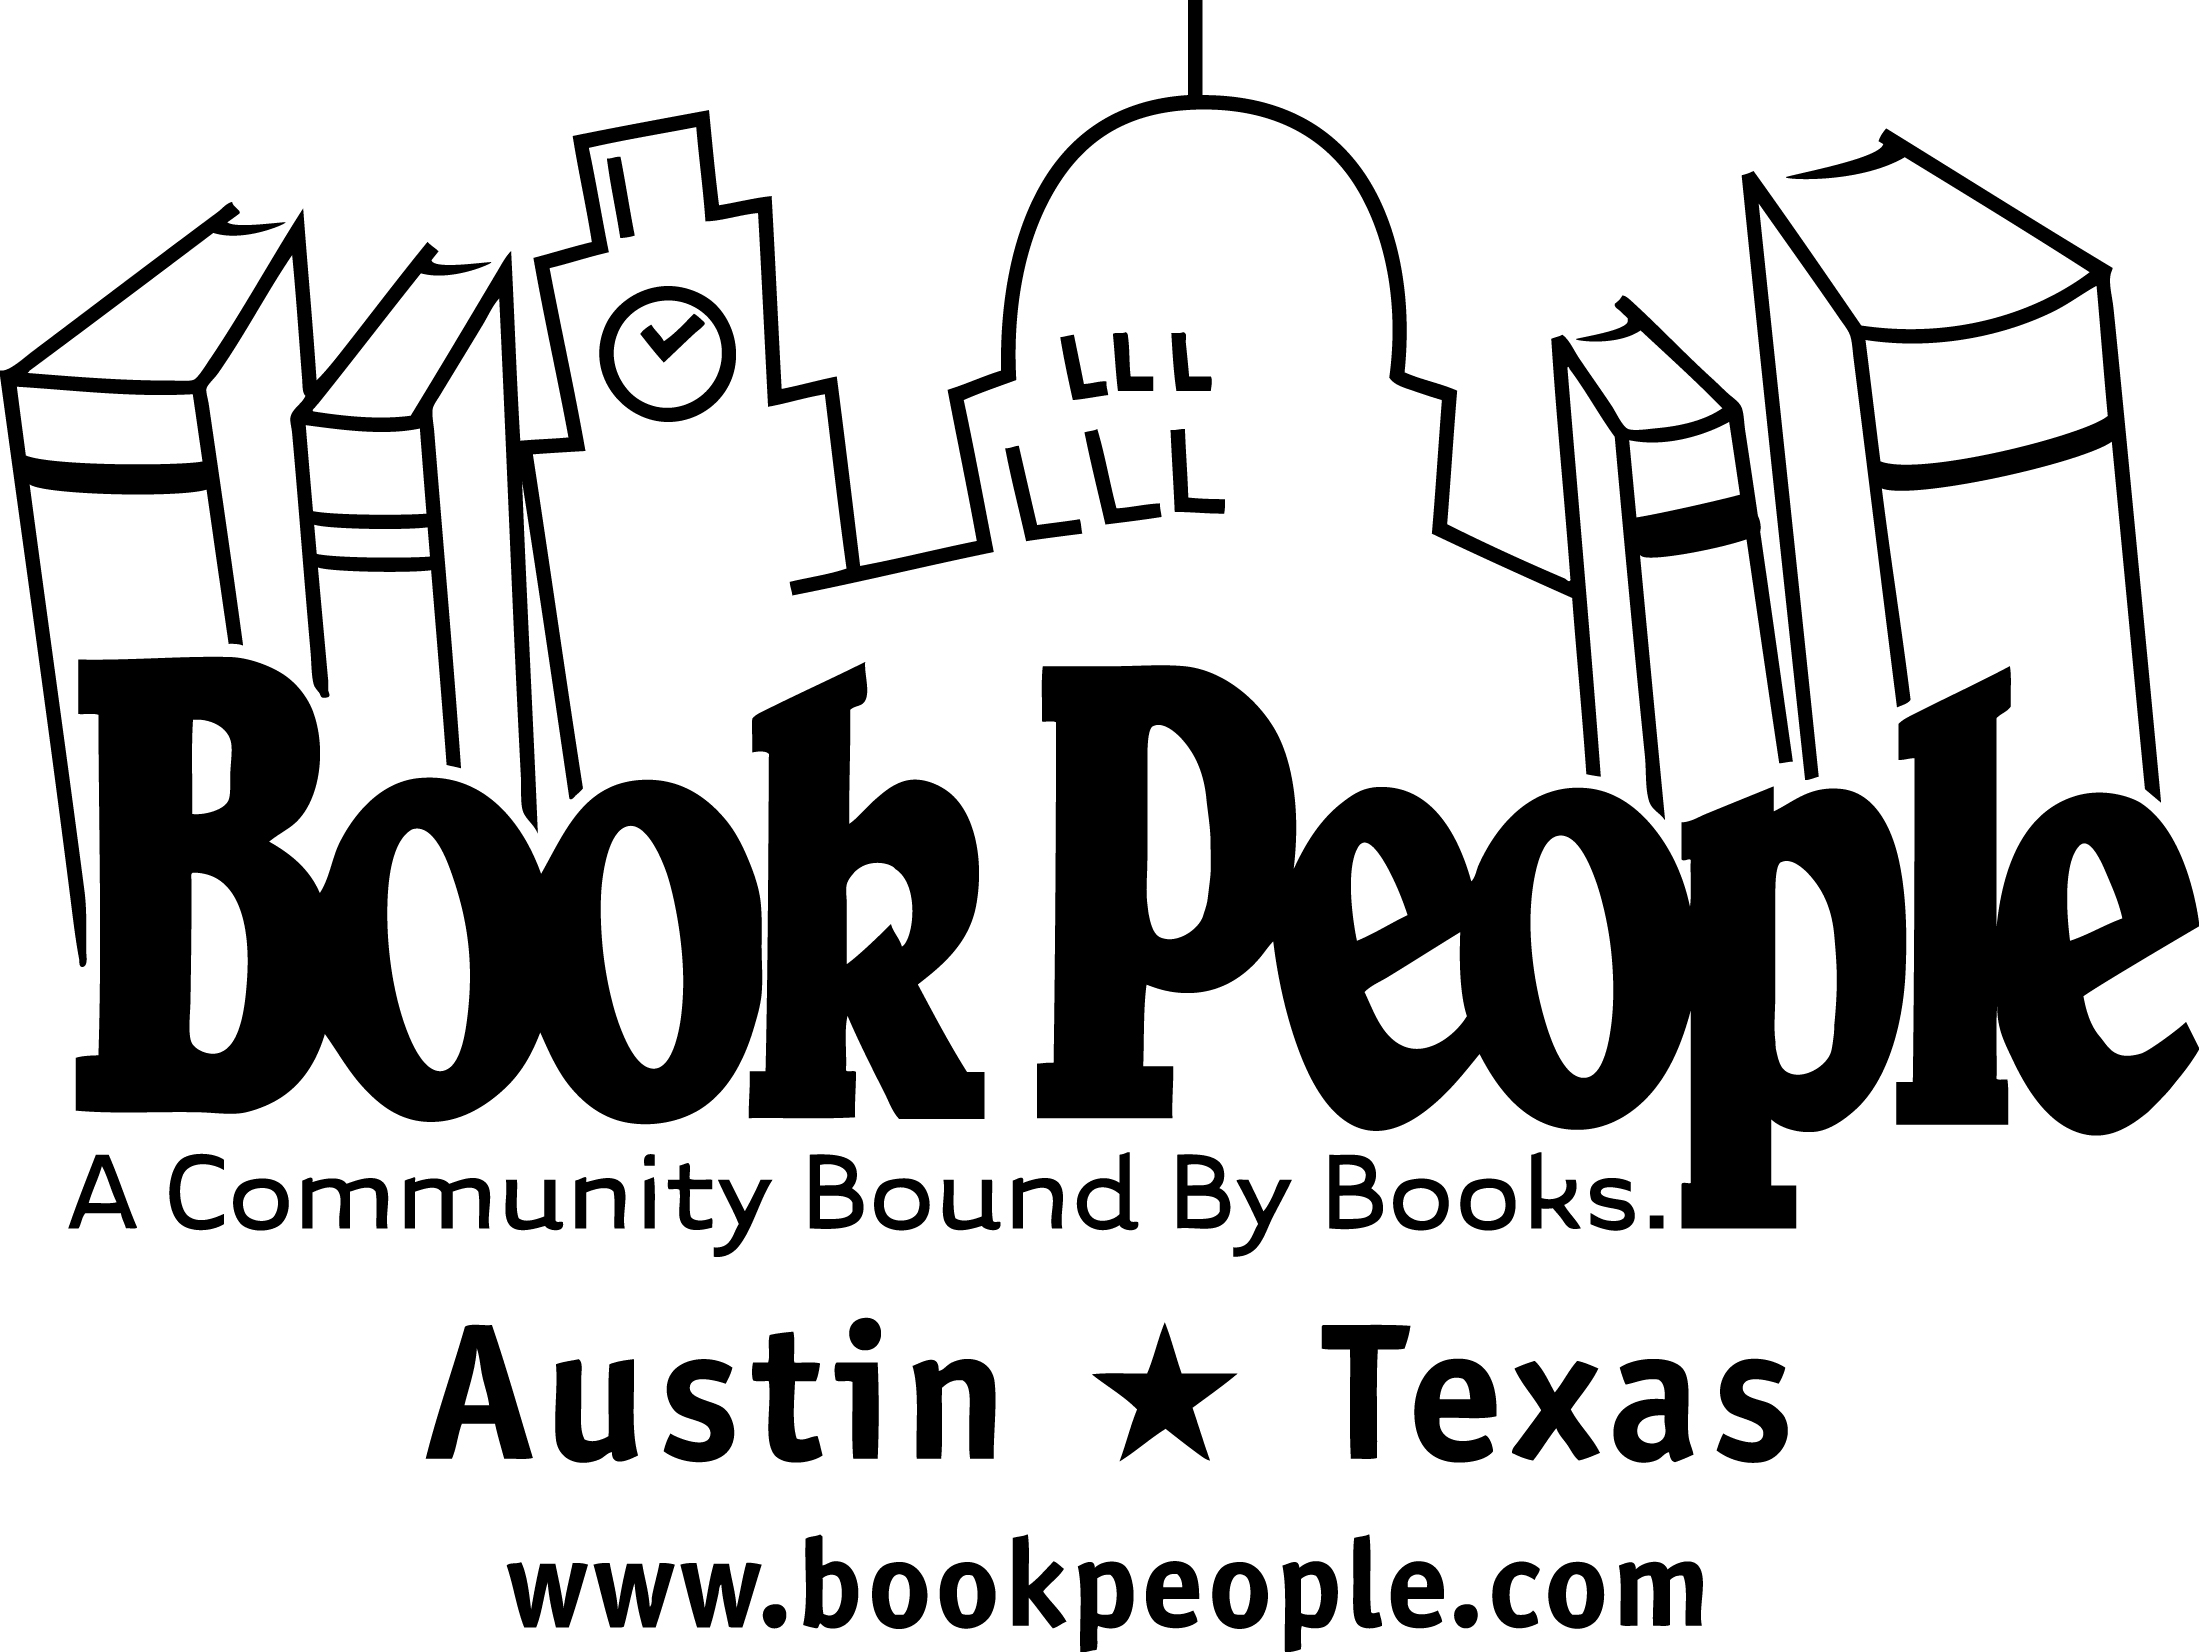 BookPeople-logo (1).jpg